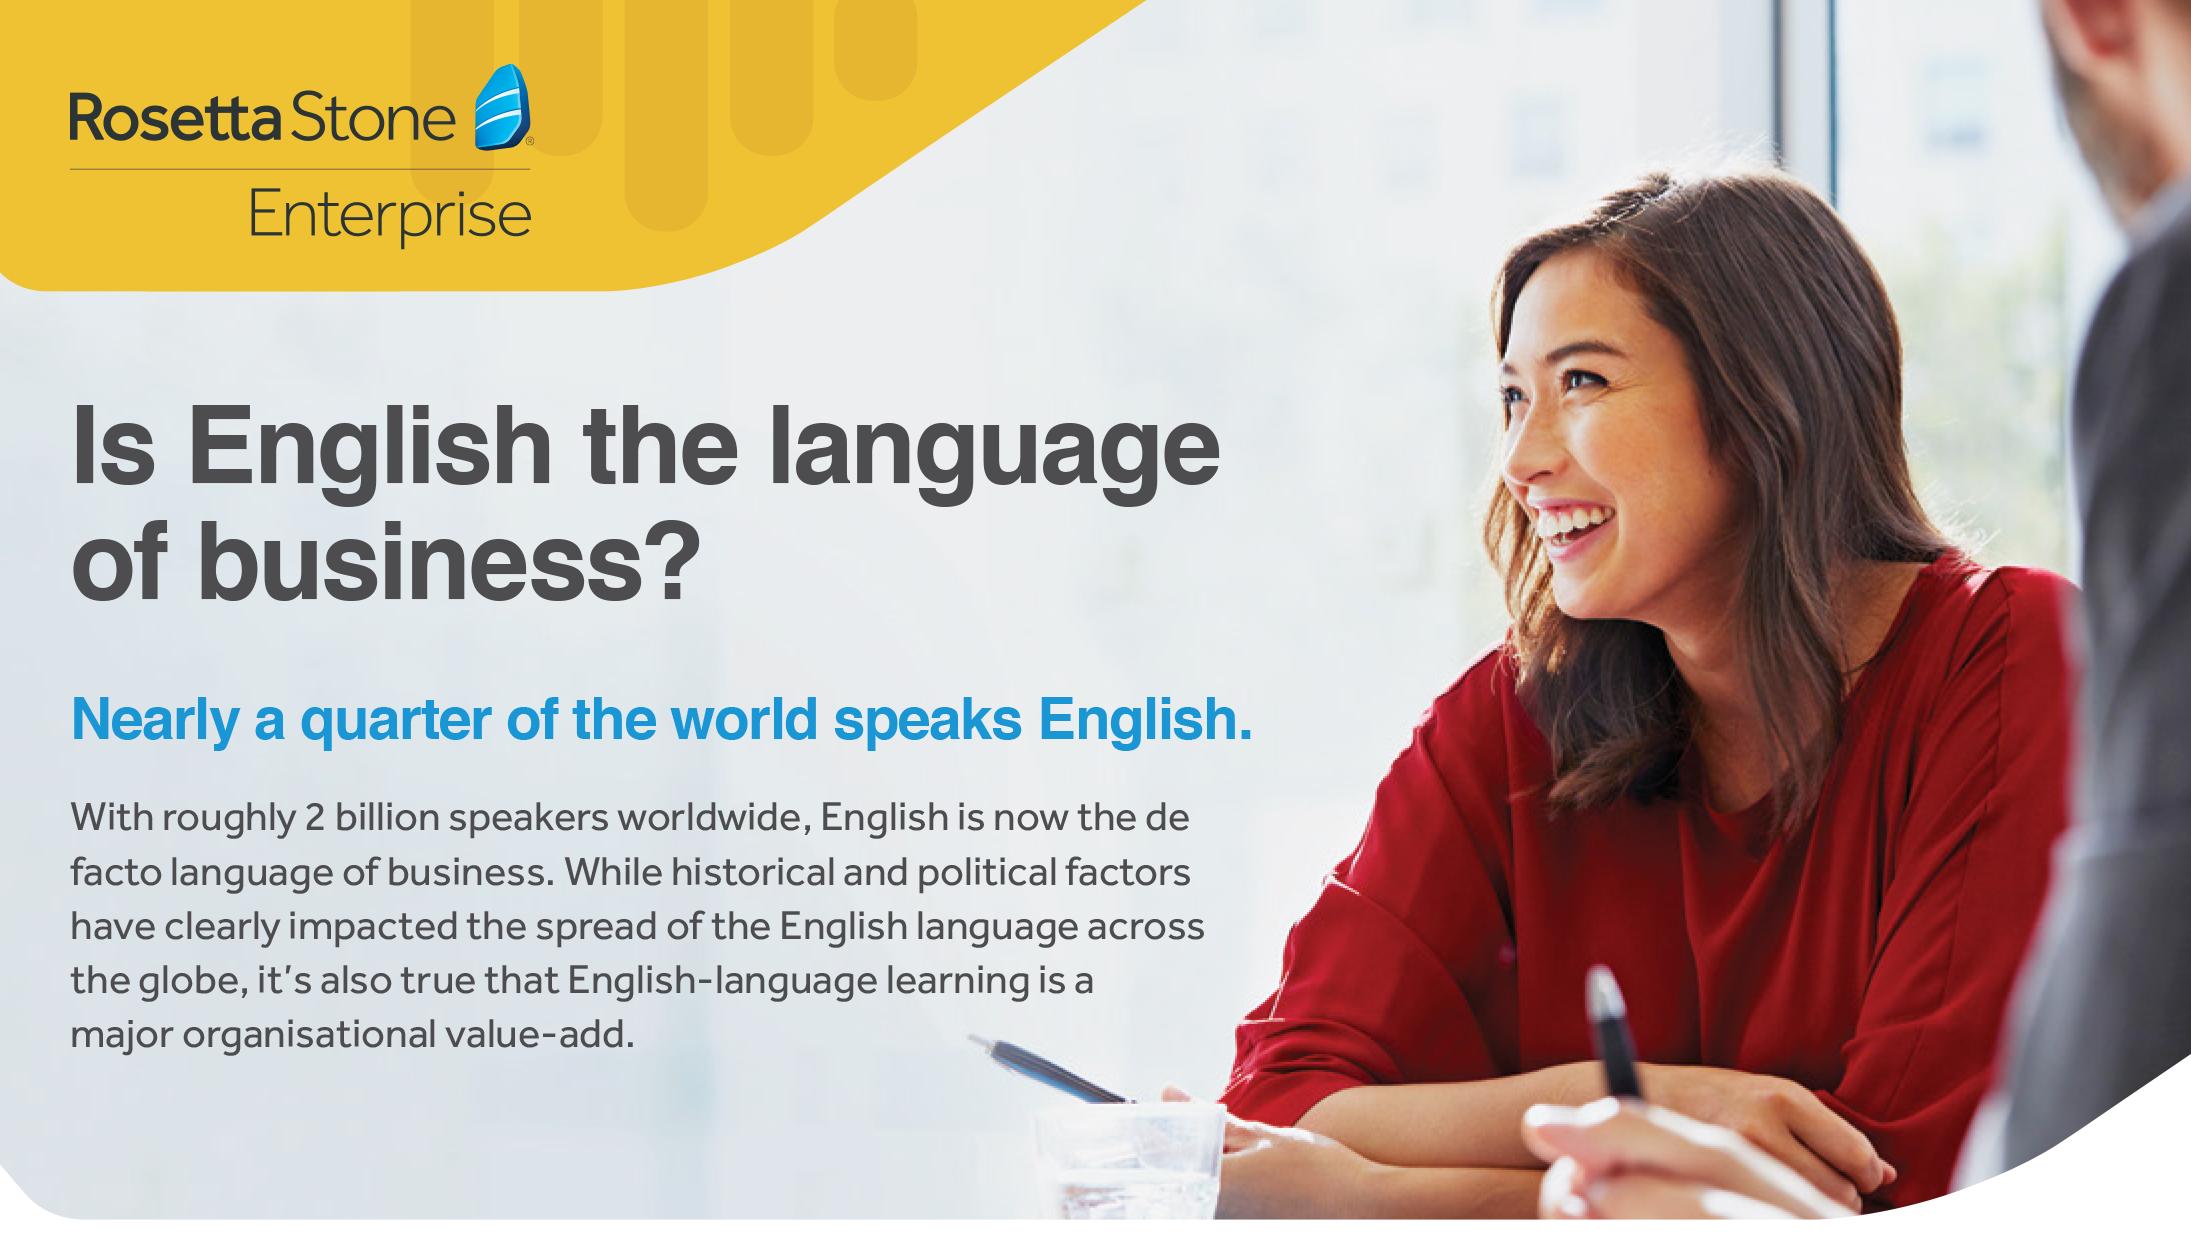 [Factsheet] Is English the language of business?